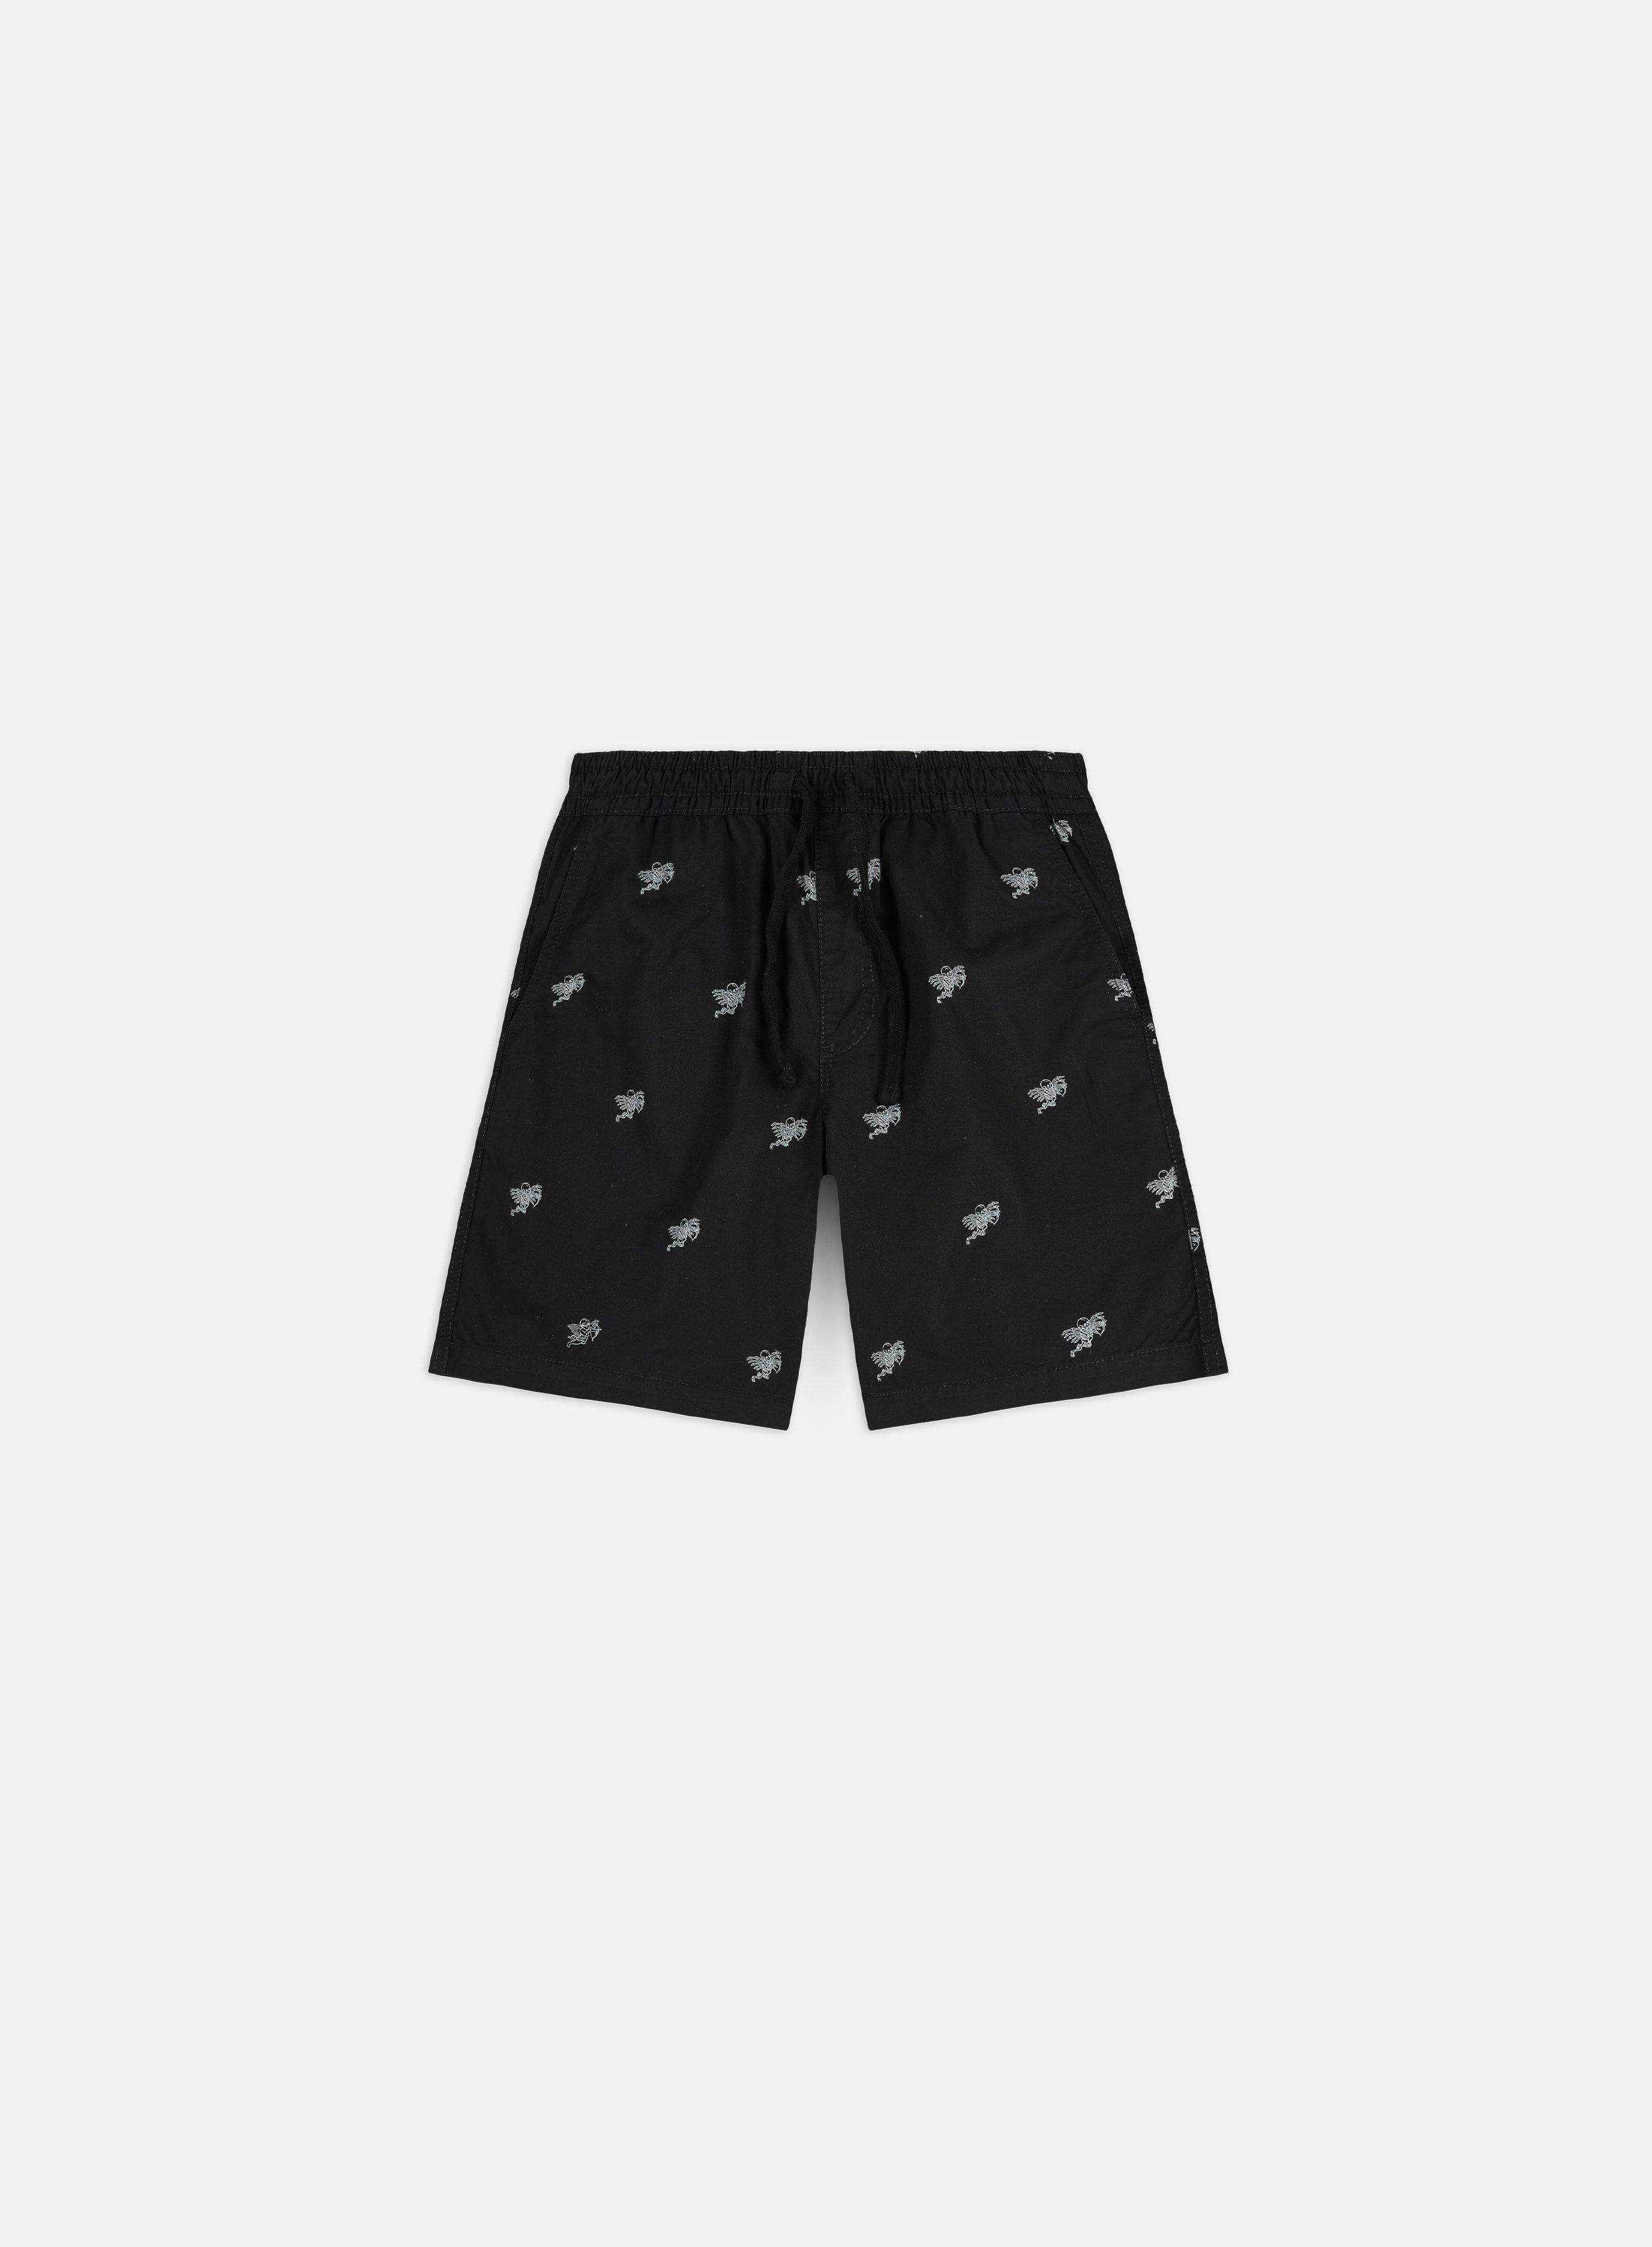 Range 18 Shorts